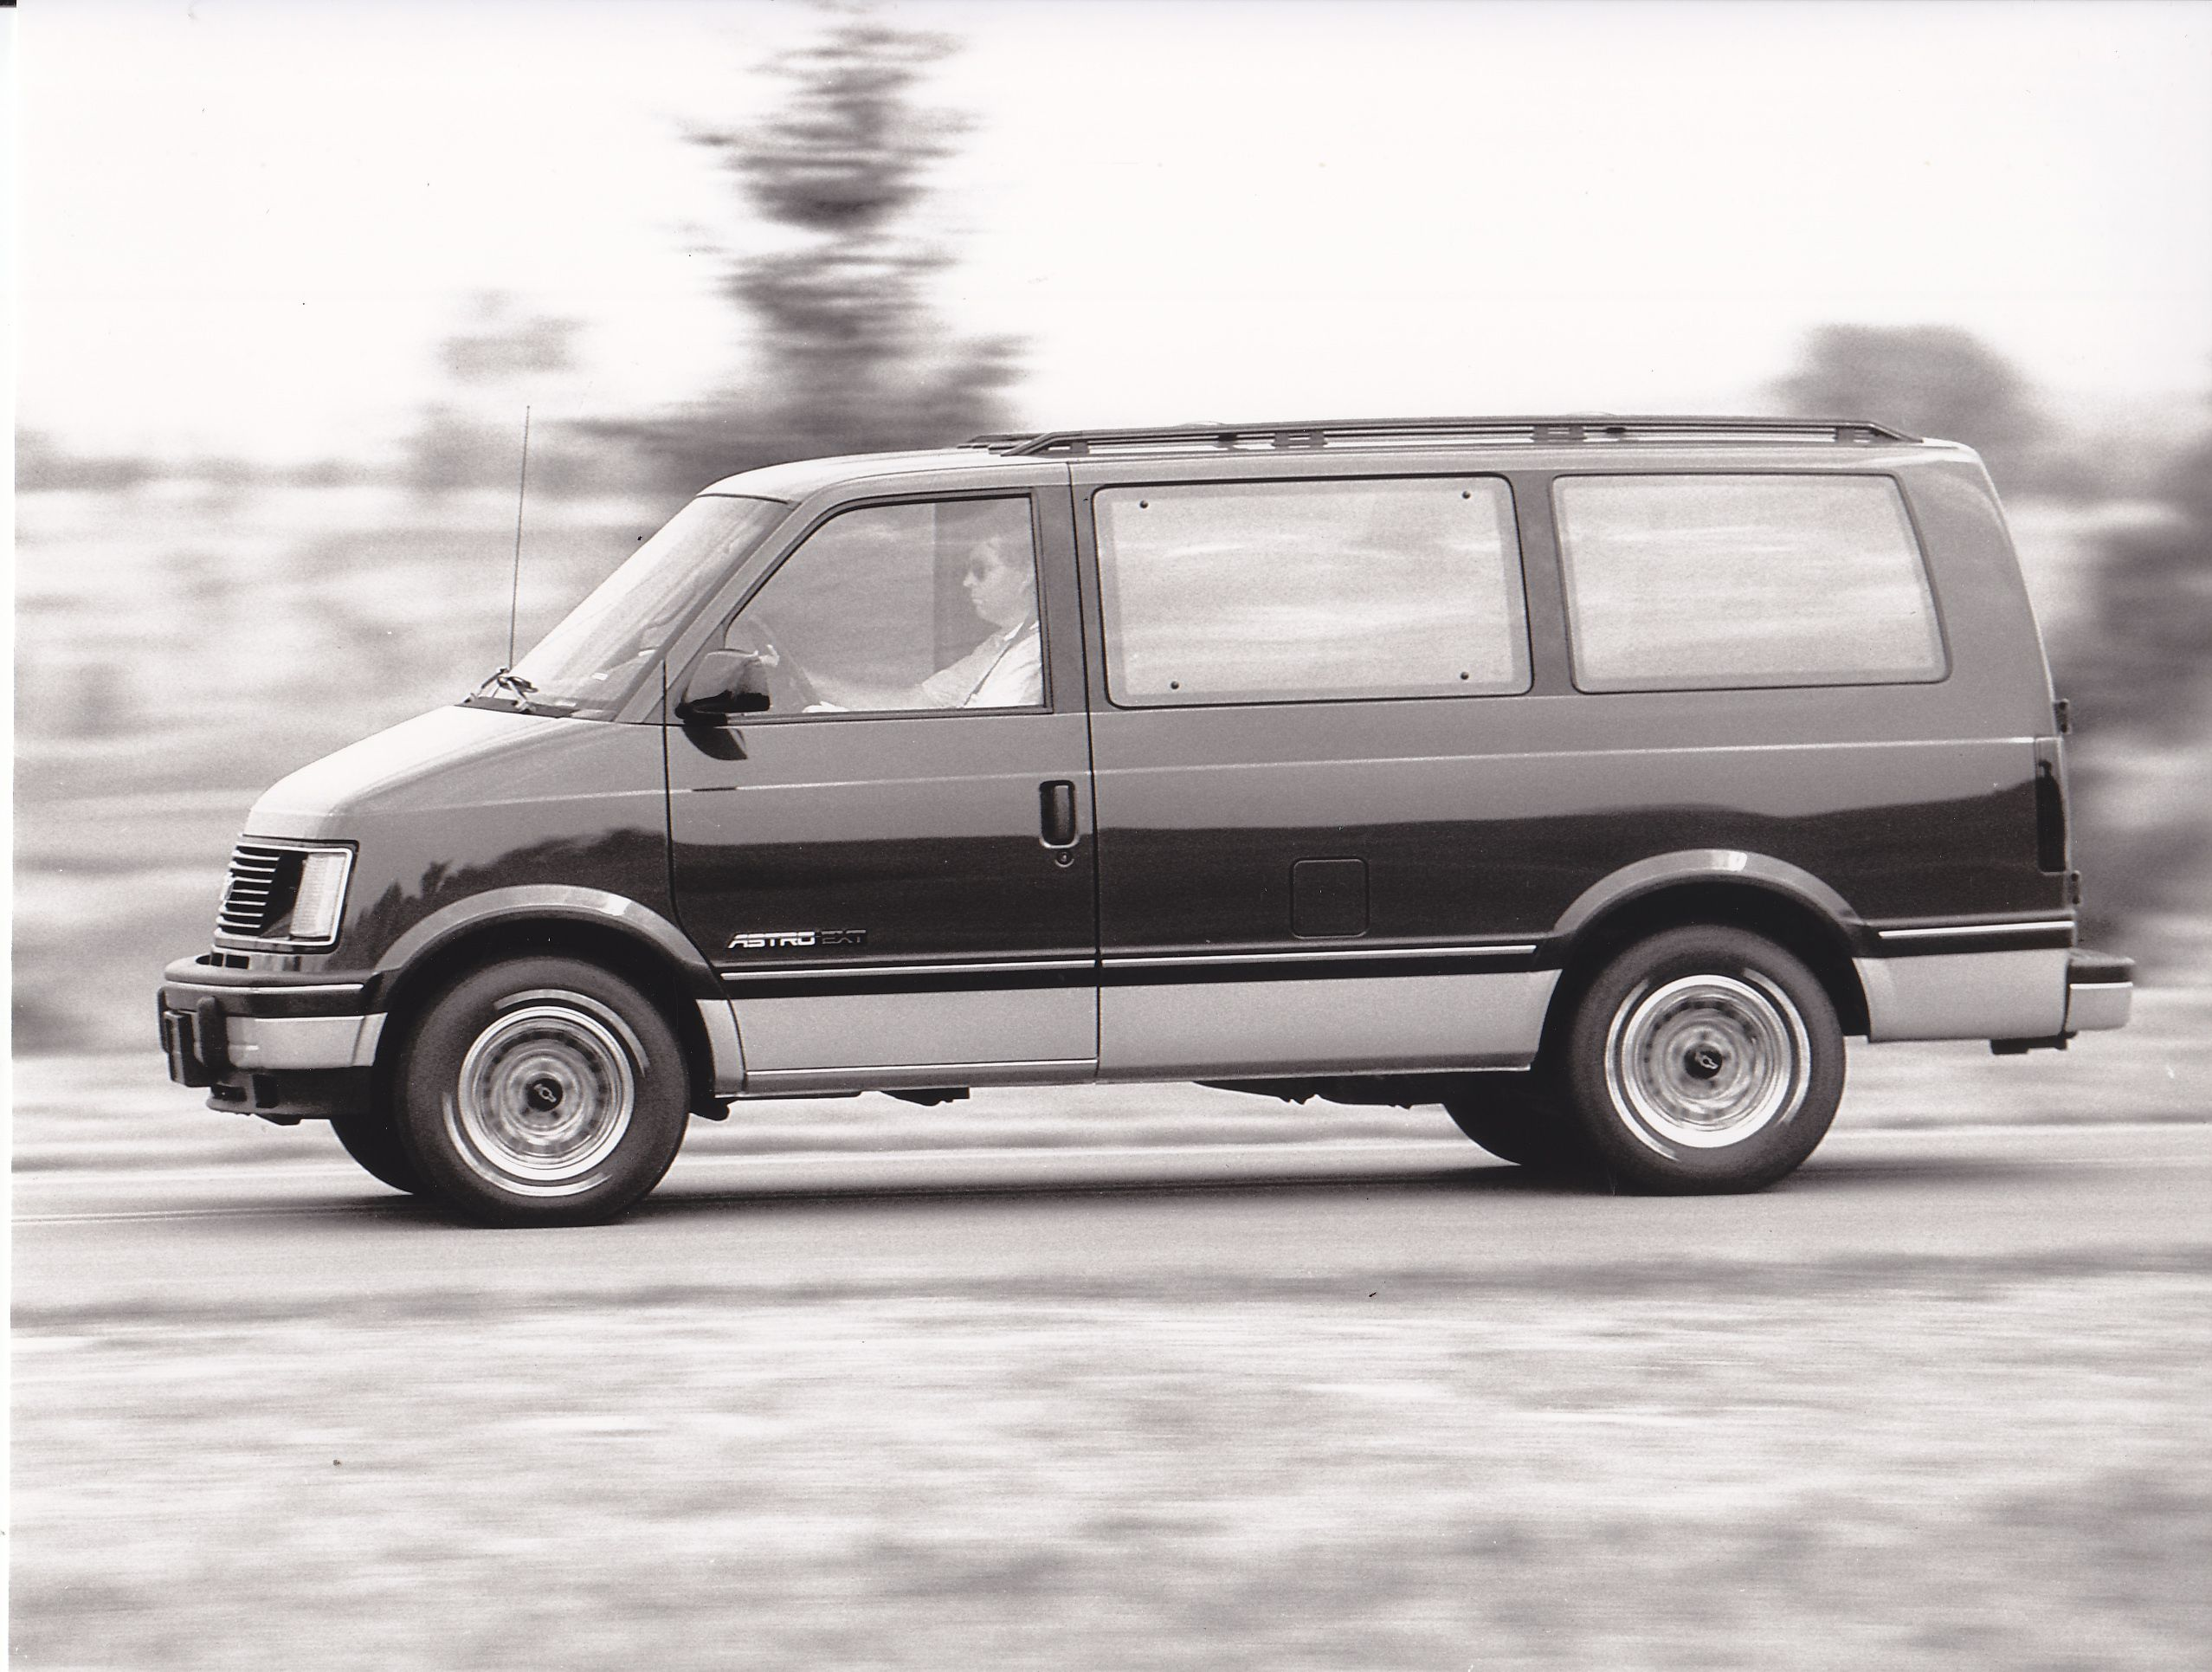 medium resolution of chevrolet astro van iaa 1991